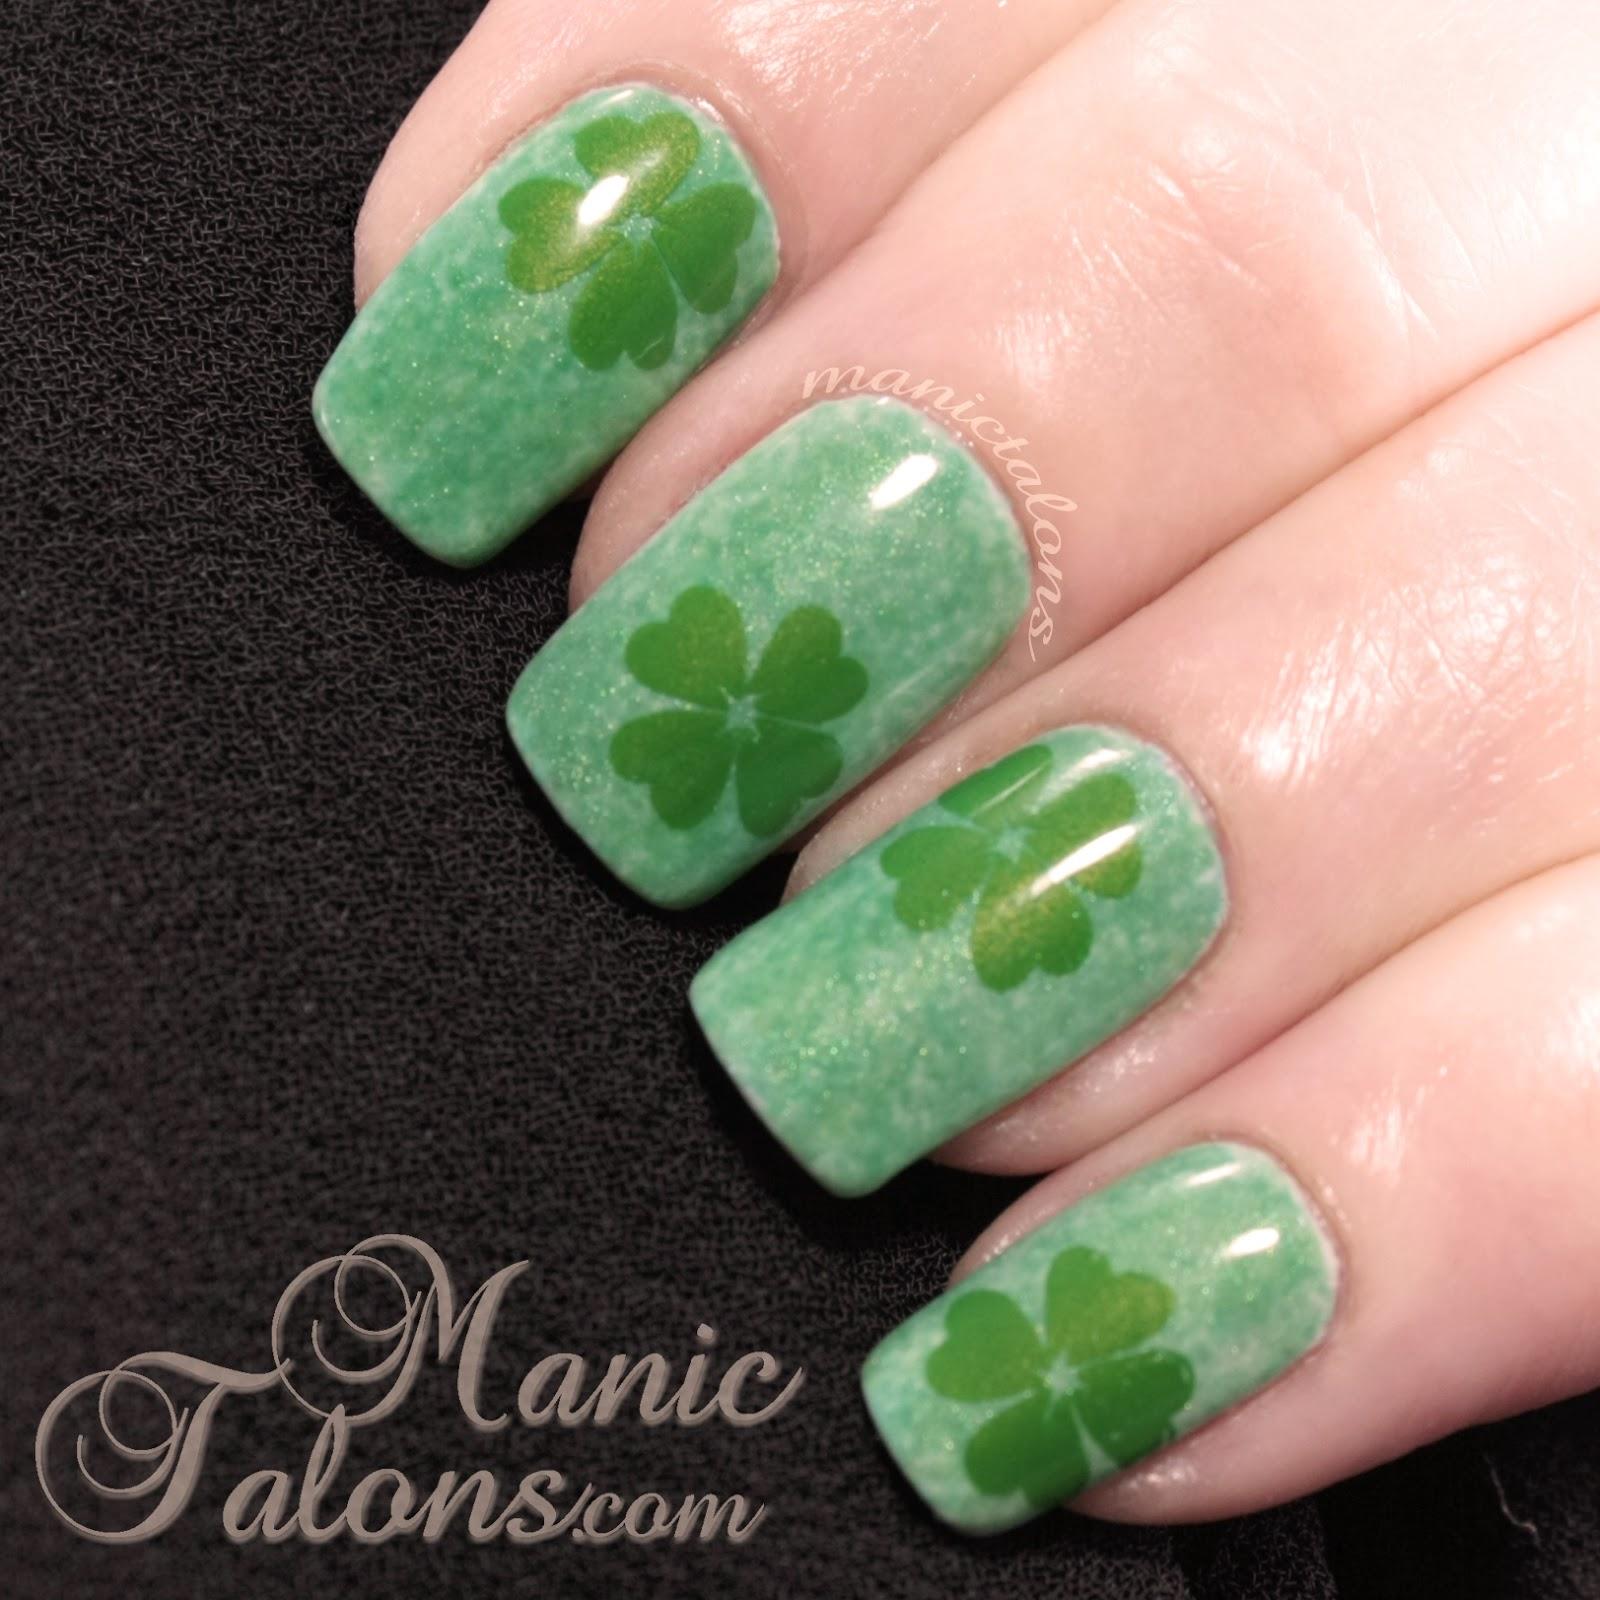 St. Patrick's Day Shamrock Gel Polish Manicure